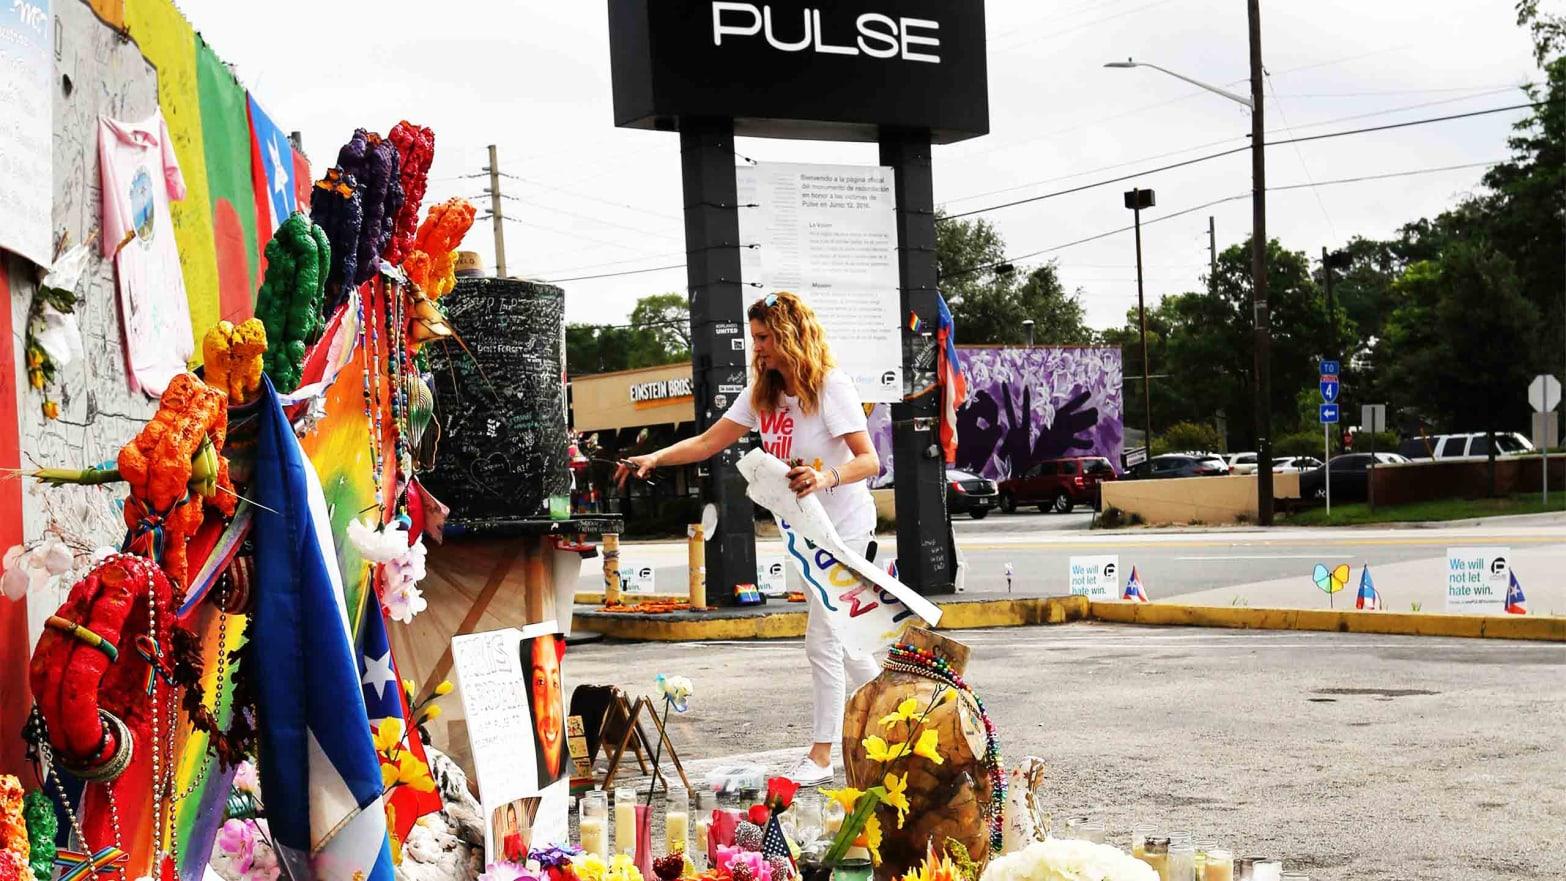 1179320f2a1 The Pulse Massacre